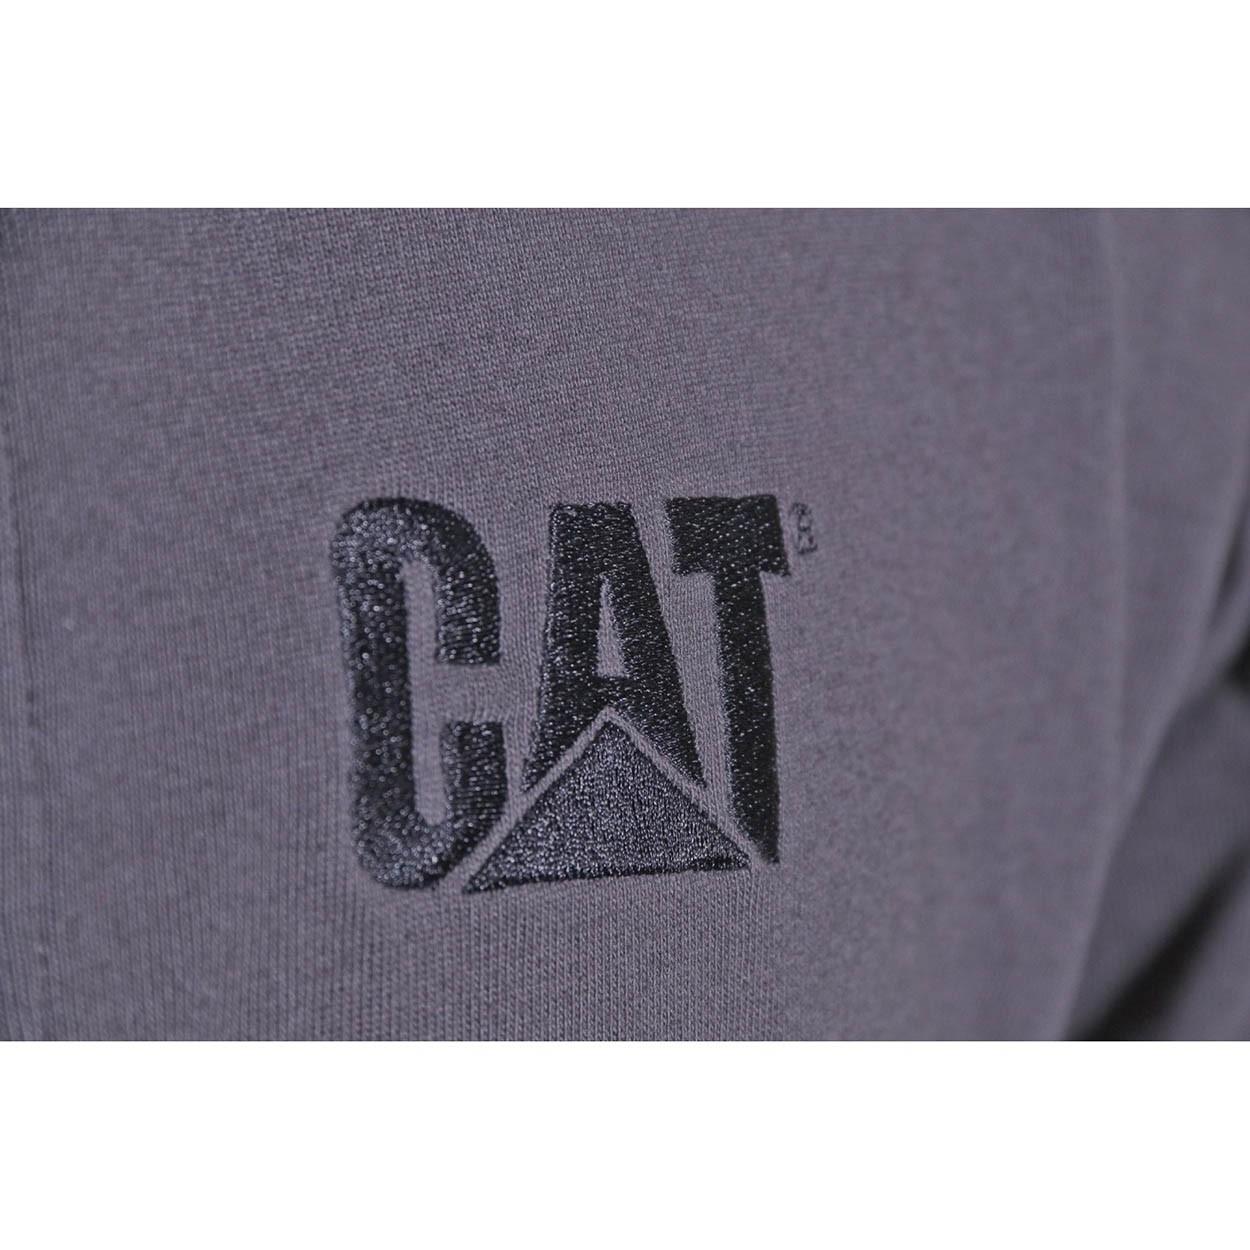 Caterpillar-Mens-Tactical-Work-Shirt-FS4644 thumbnail 9